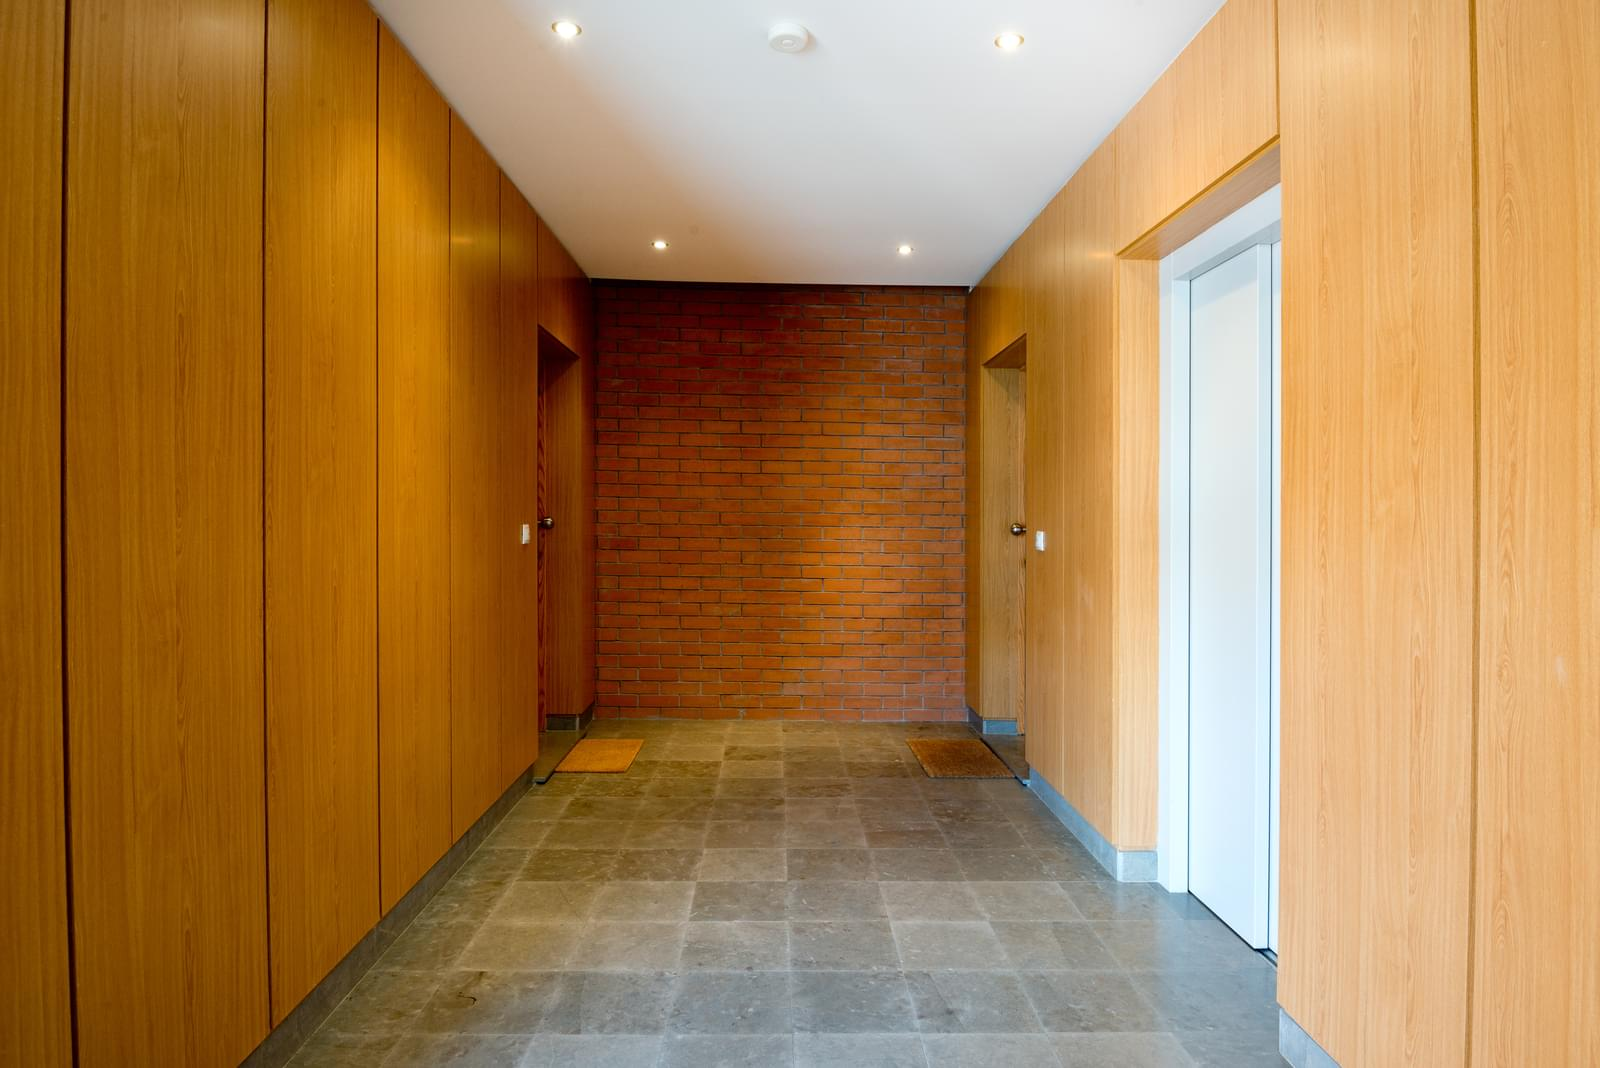 pf17099-apartamento-t3-sintra-36980a40-bb40-4186-8205-b1444571a509